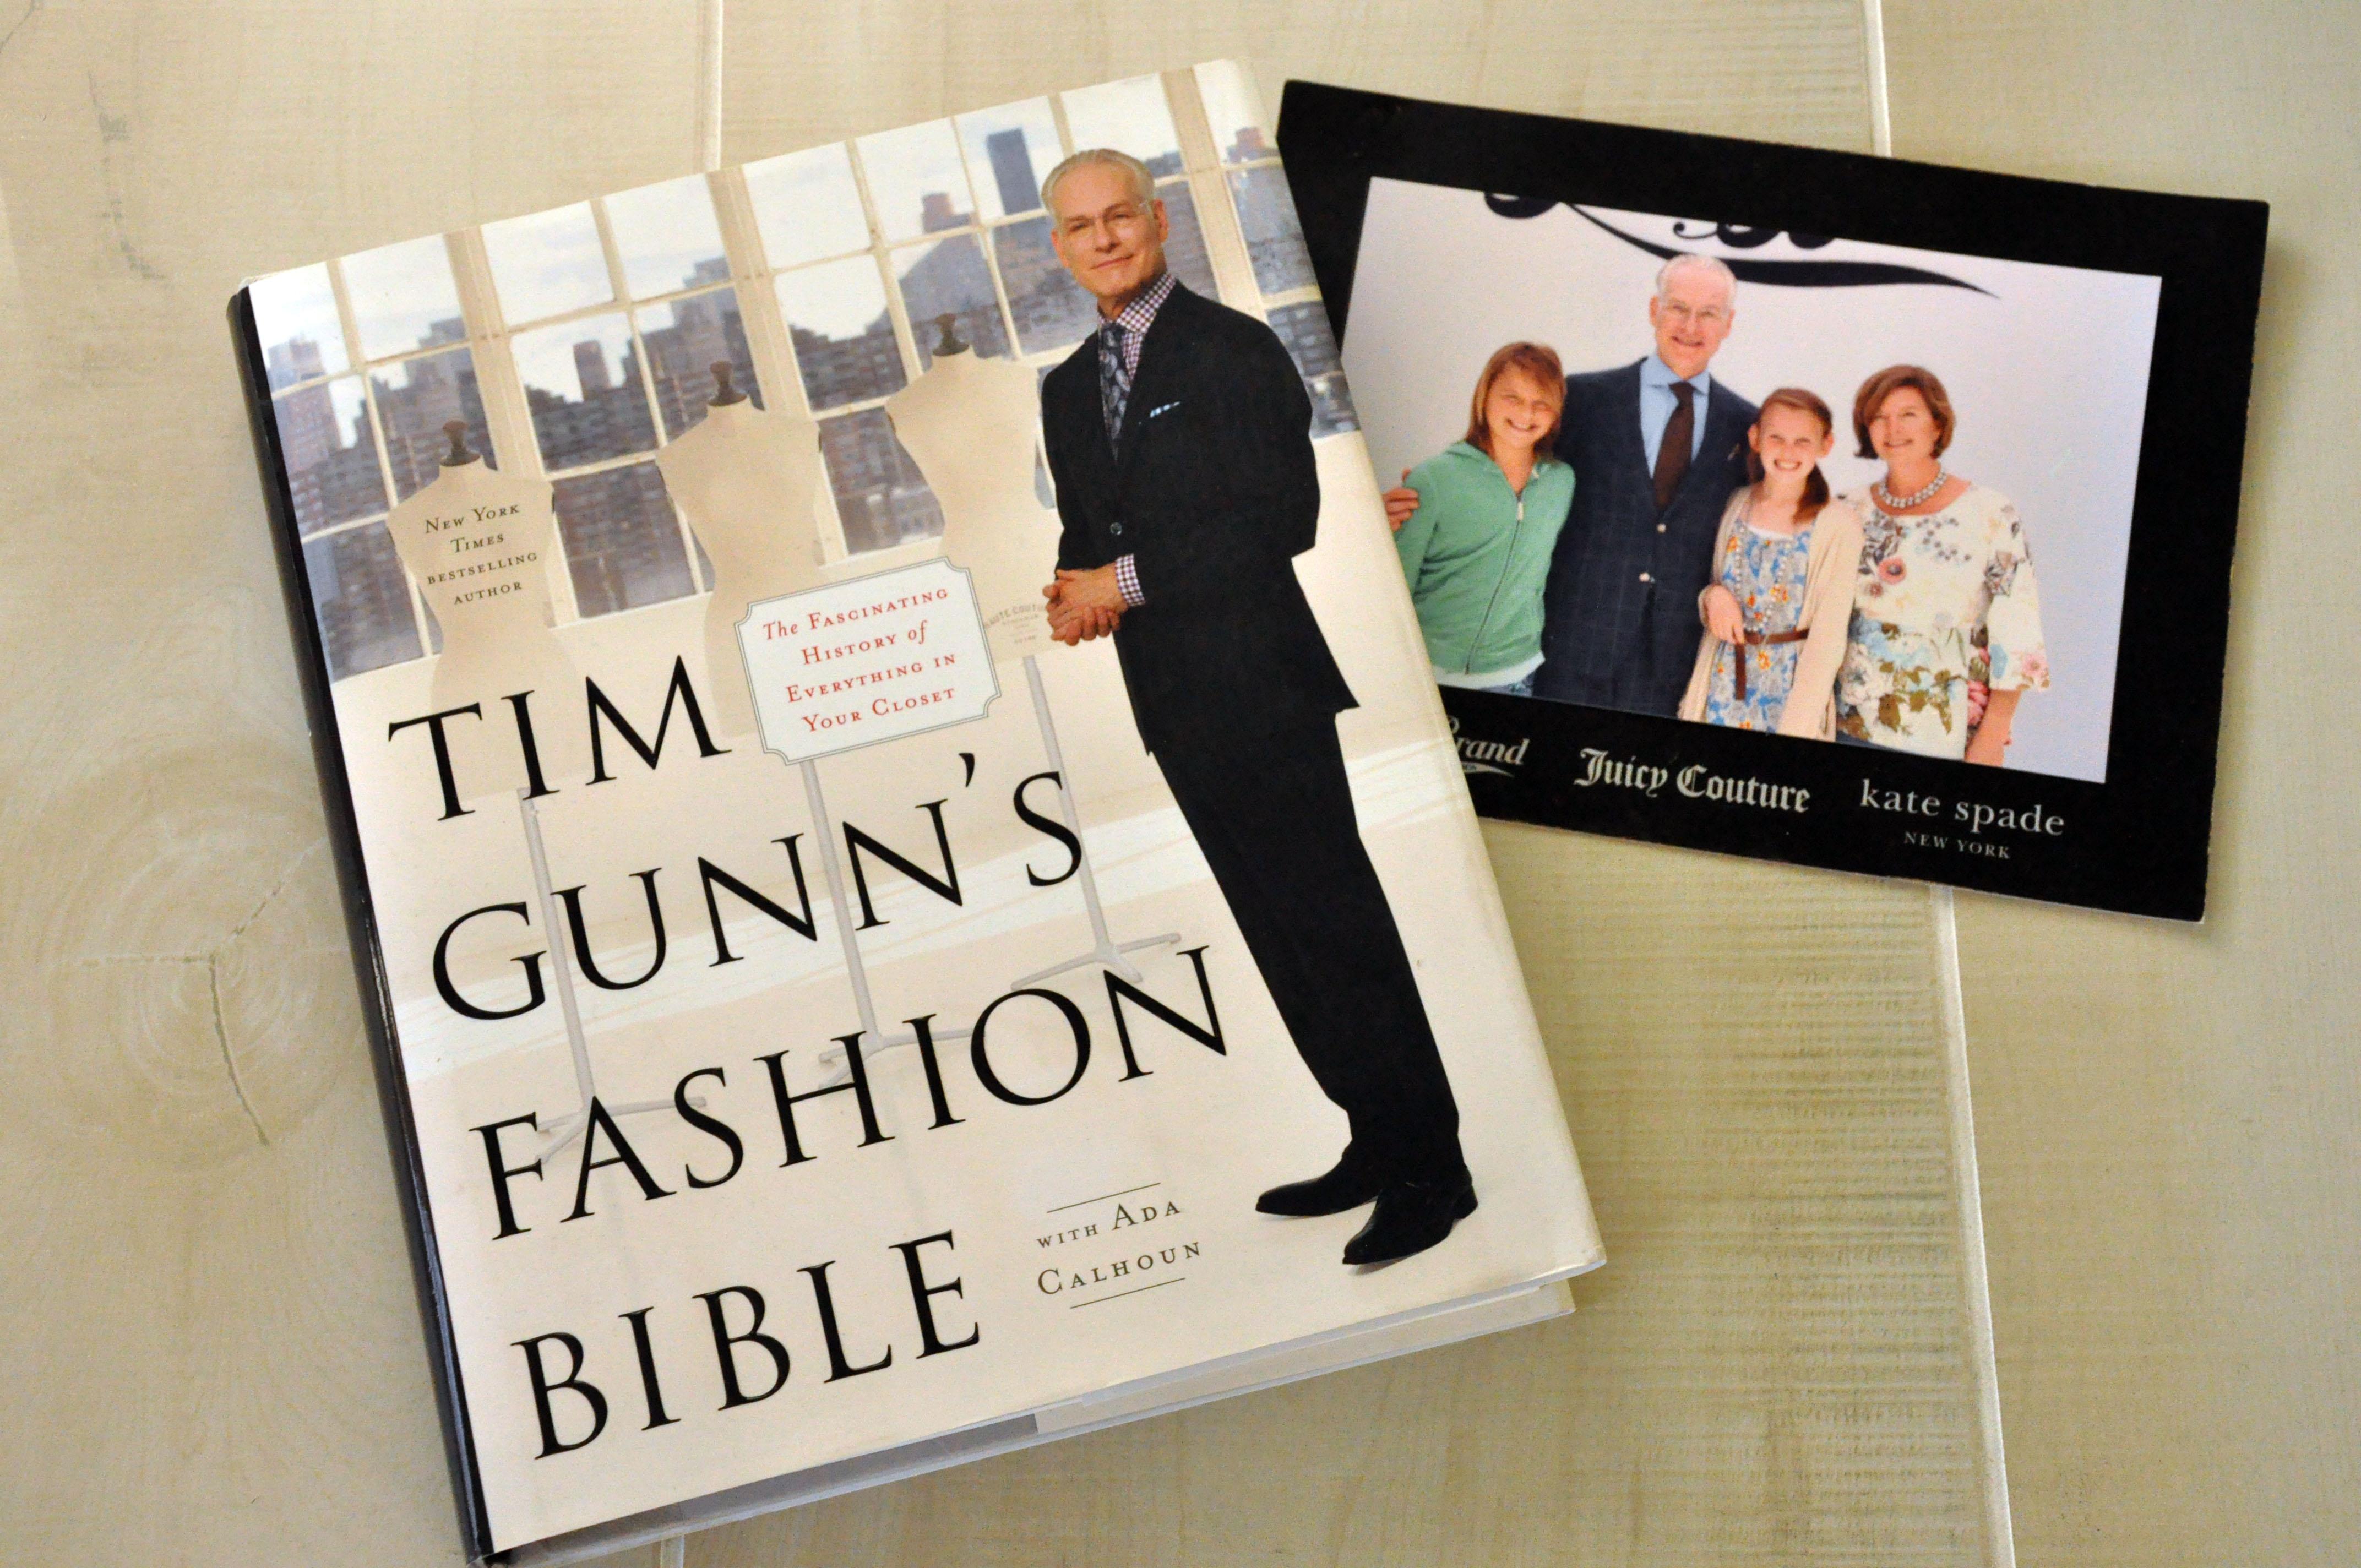 Tim Gunn's Fashion Bible Giveaway from AmyBarickman.com